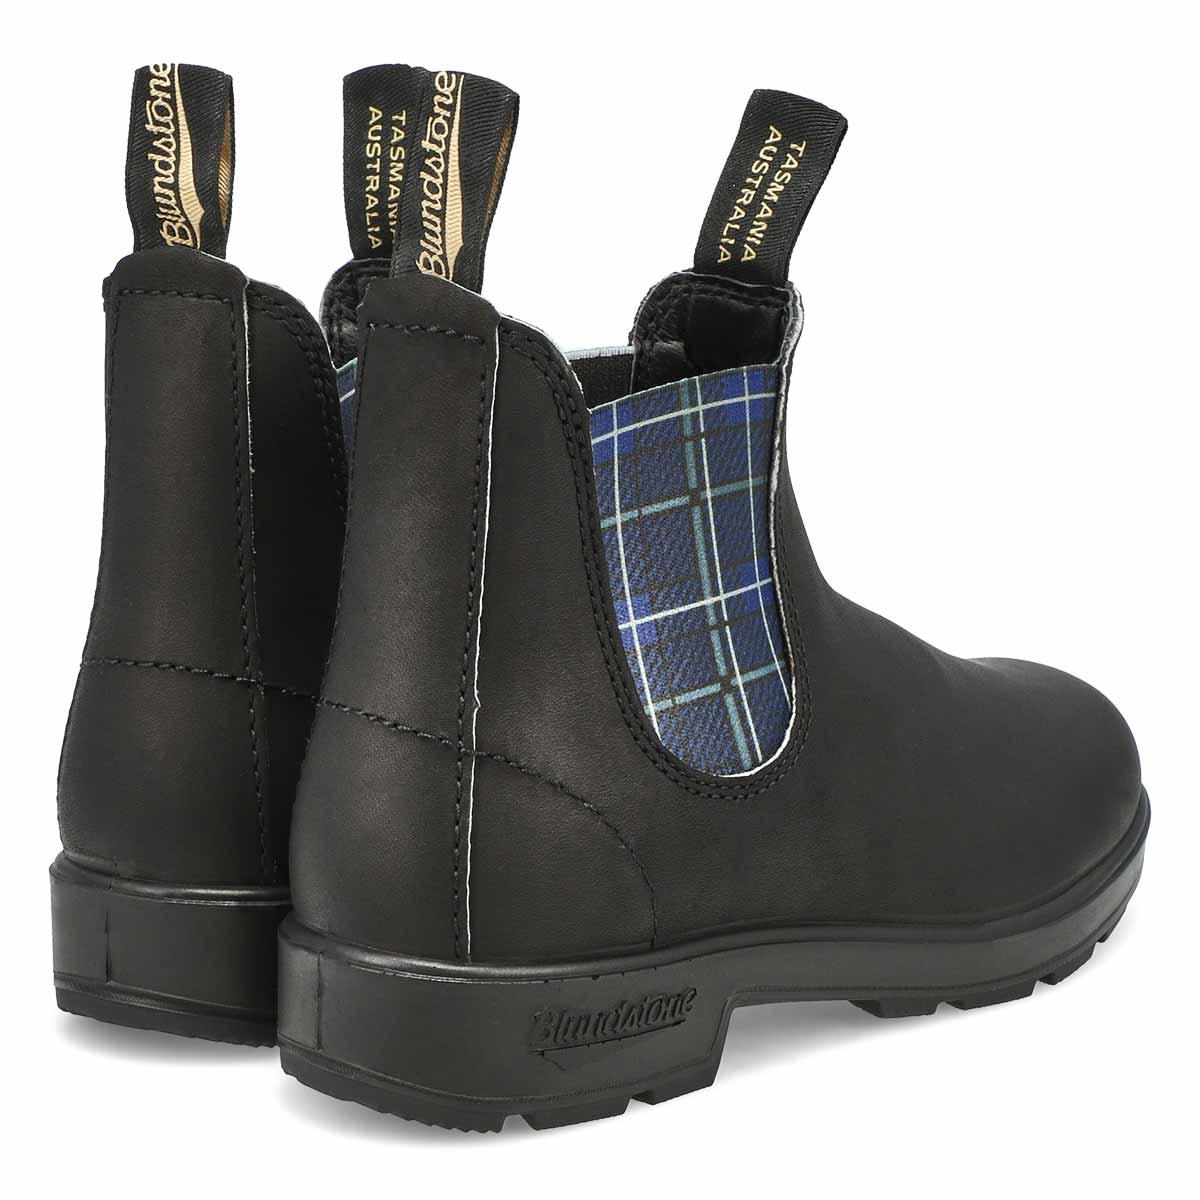 Unisex 2102 Original Boot - Black/Navy